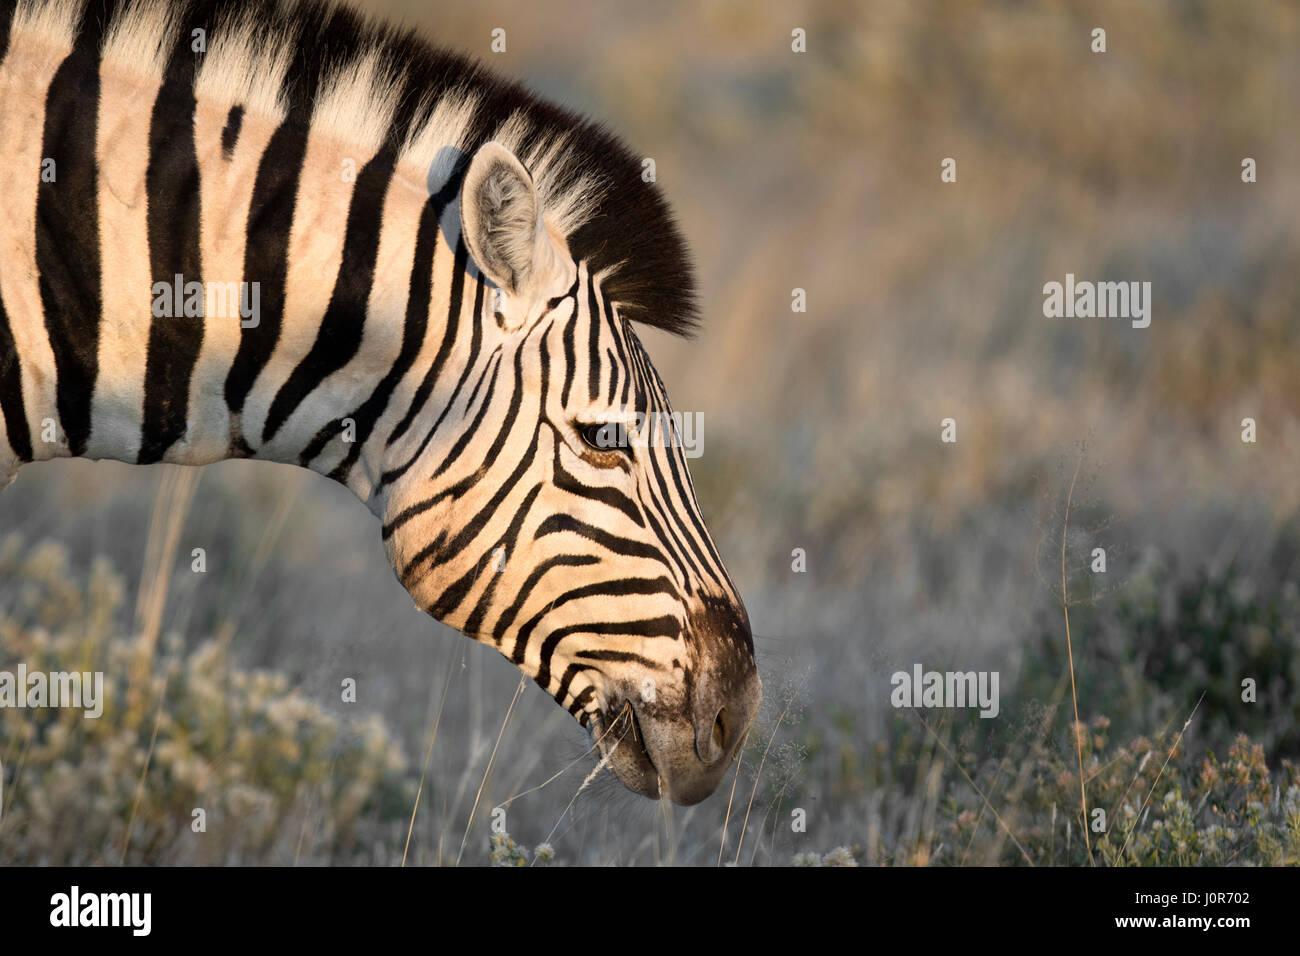 Zebra grazing in Etosha National Park. Stock Photo